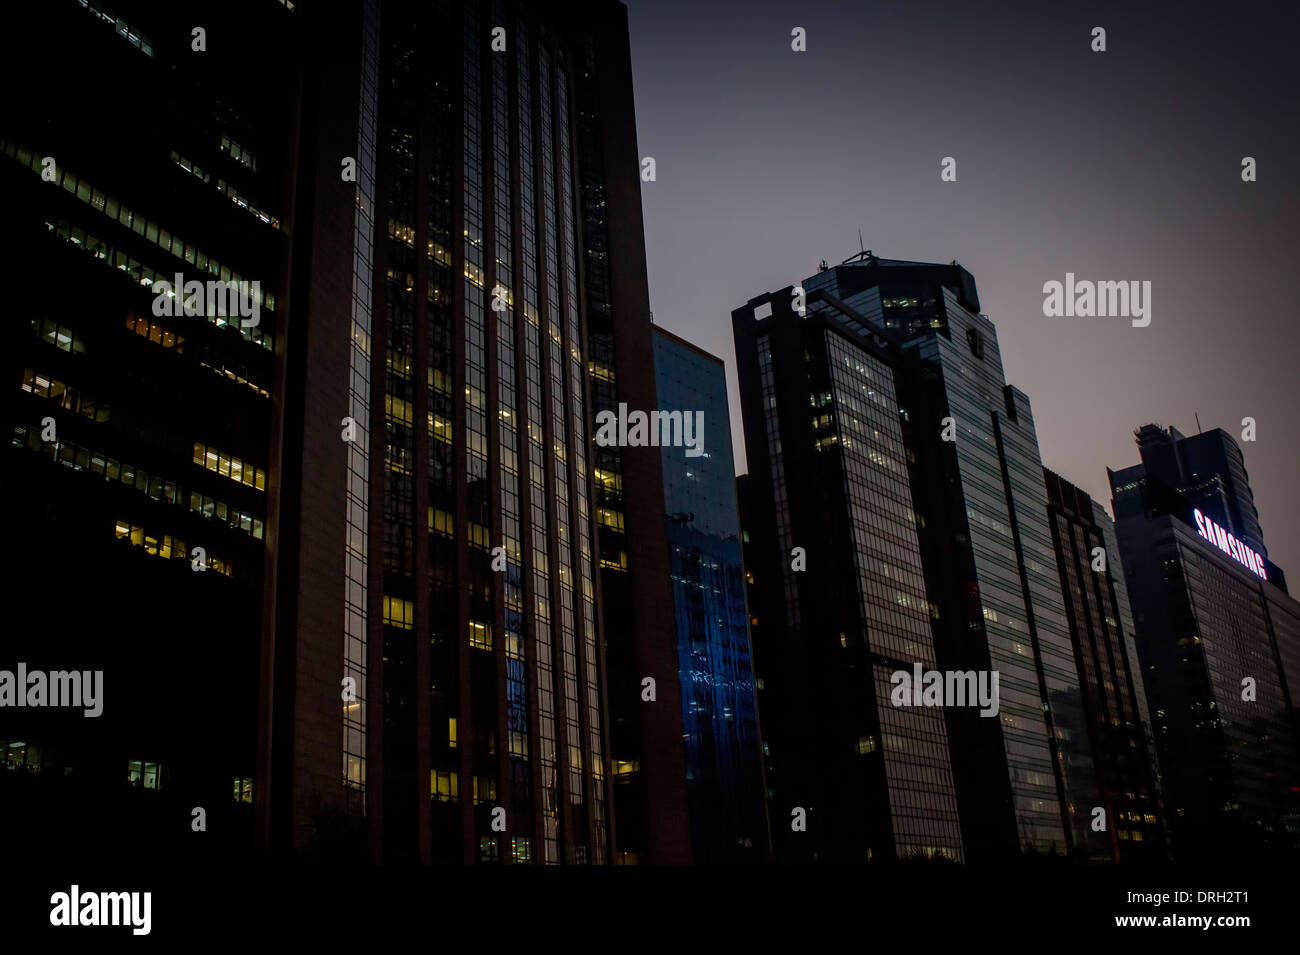 hongkong urban evening dark perspective - Stock Image